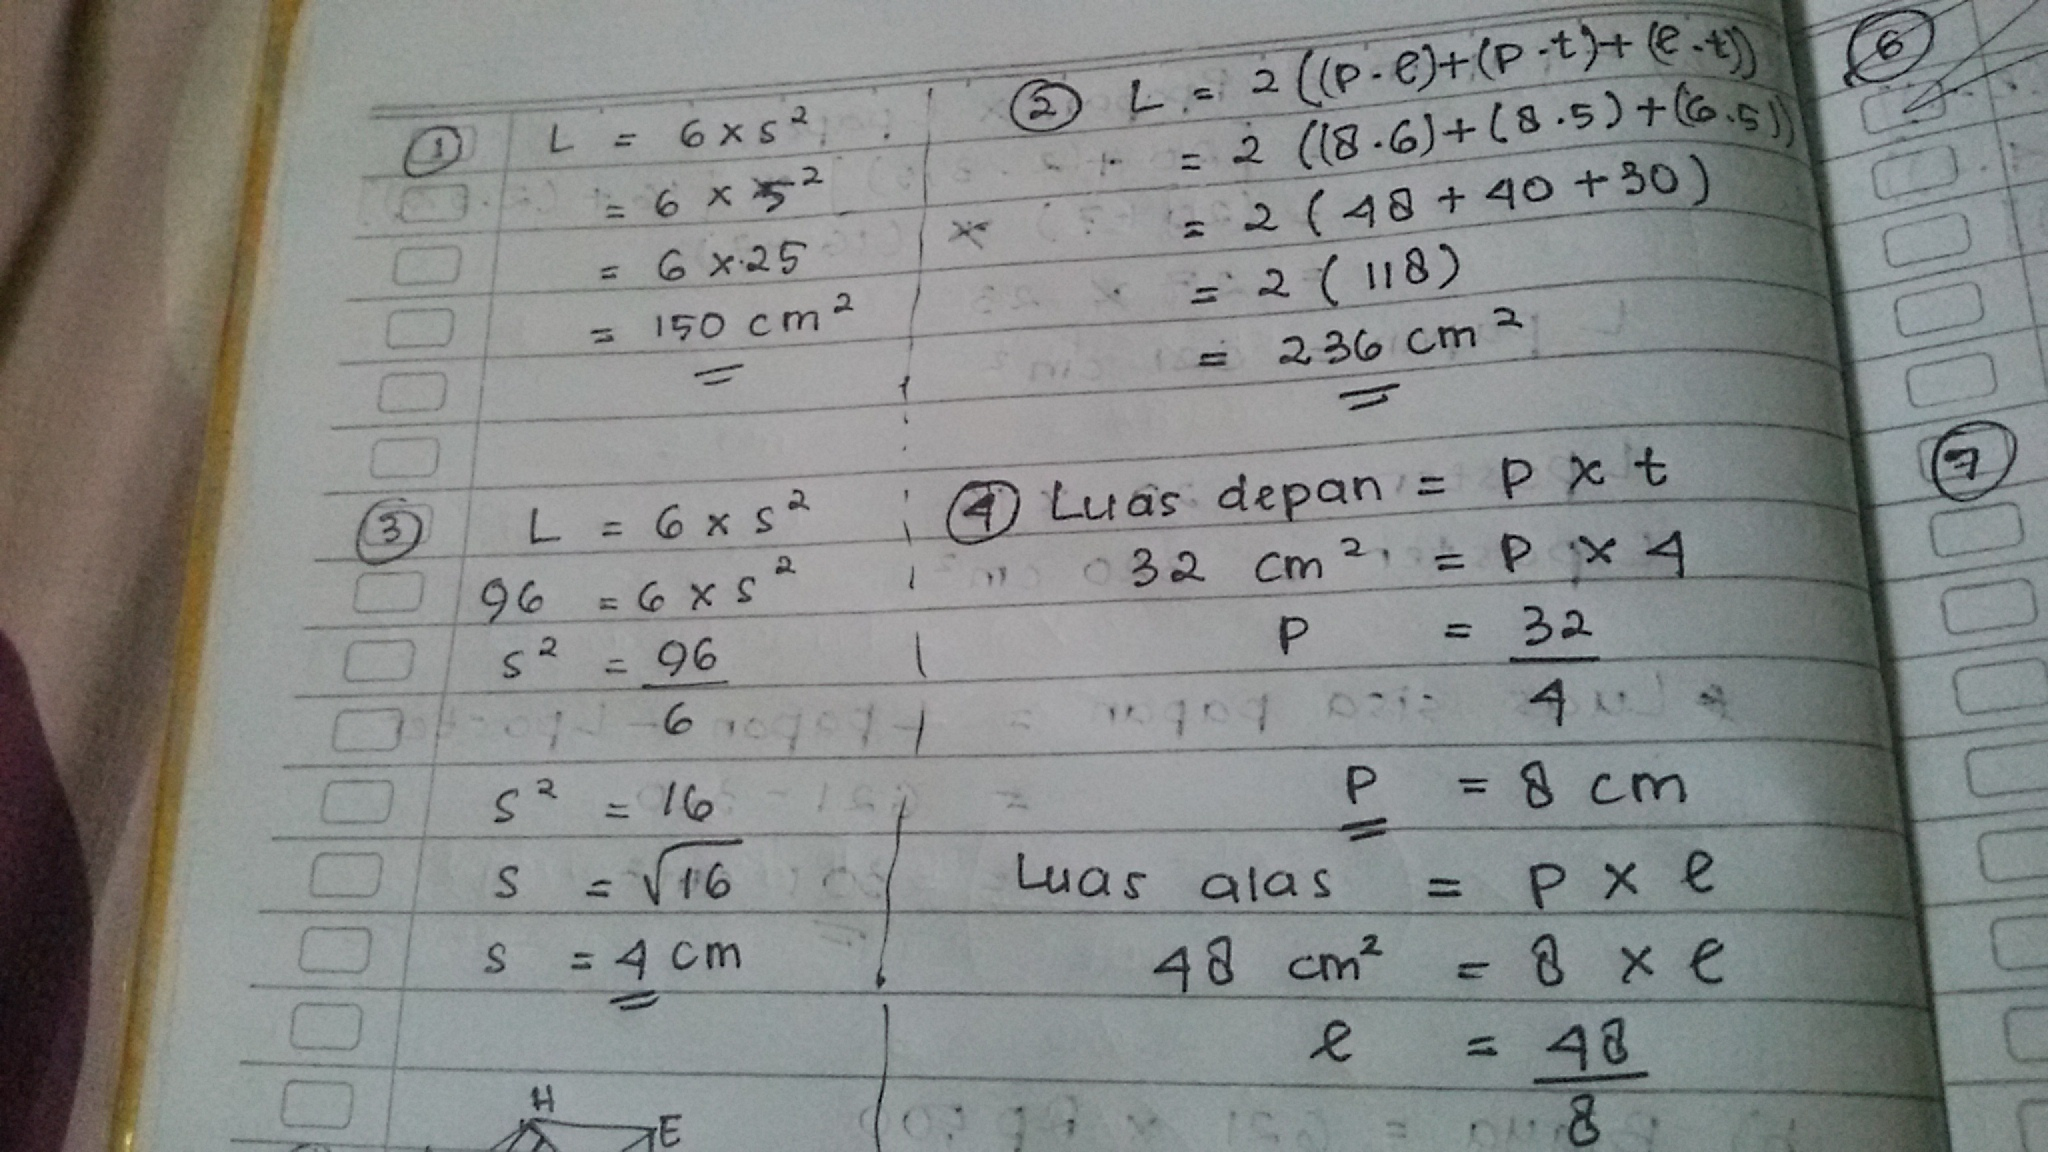 1. Luas permukaan kubus dengan panjang rusuk 5 cm adalah ...